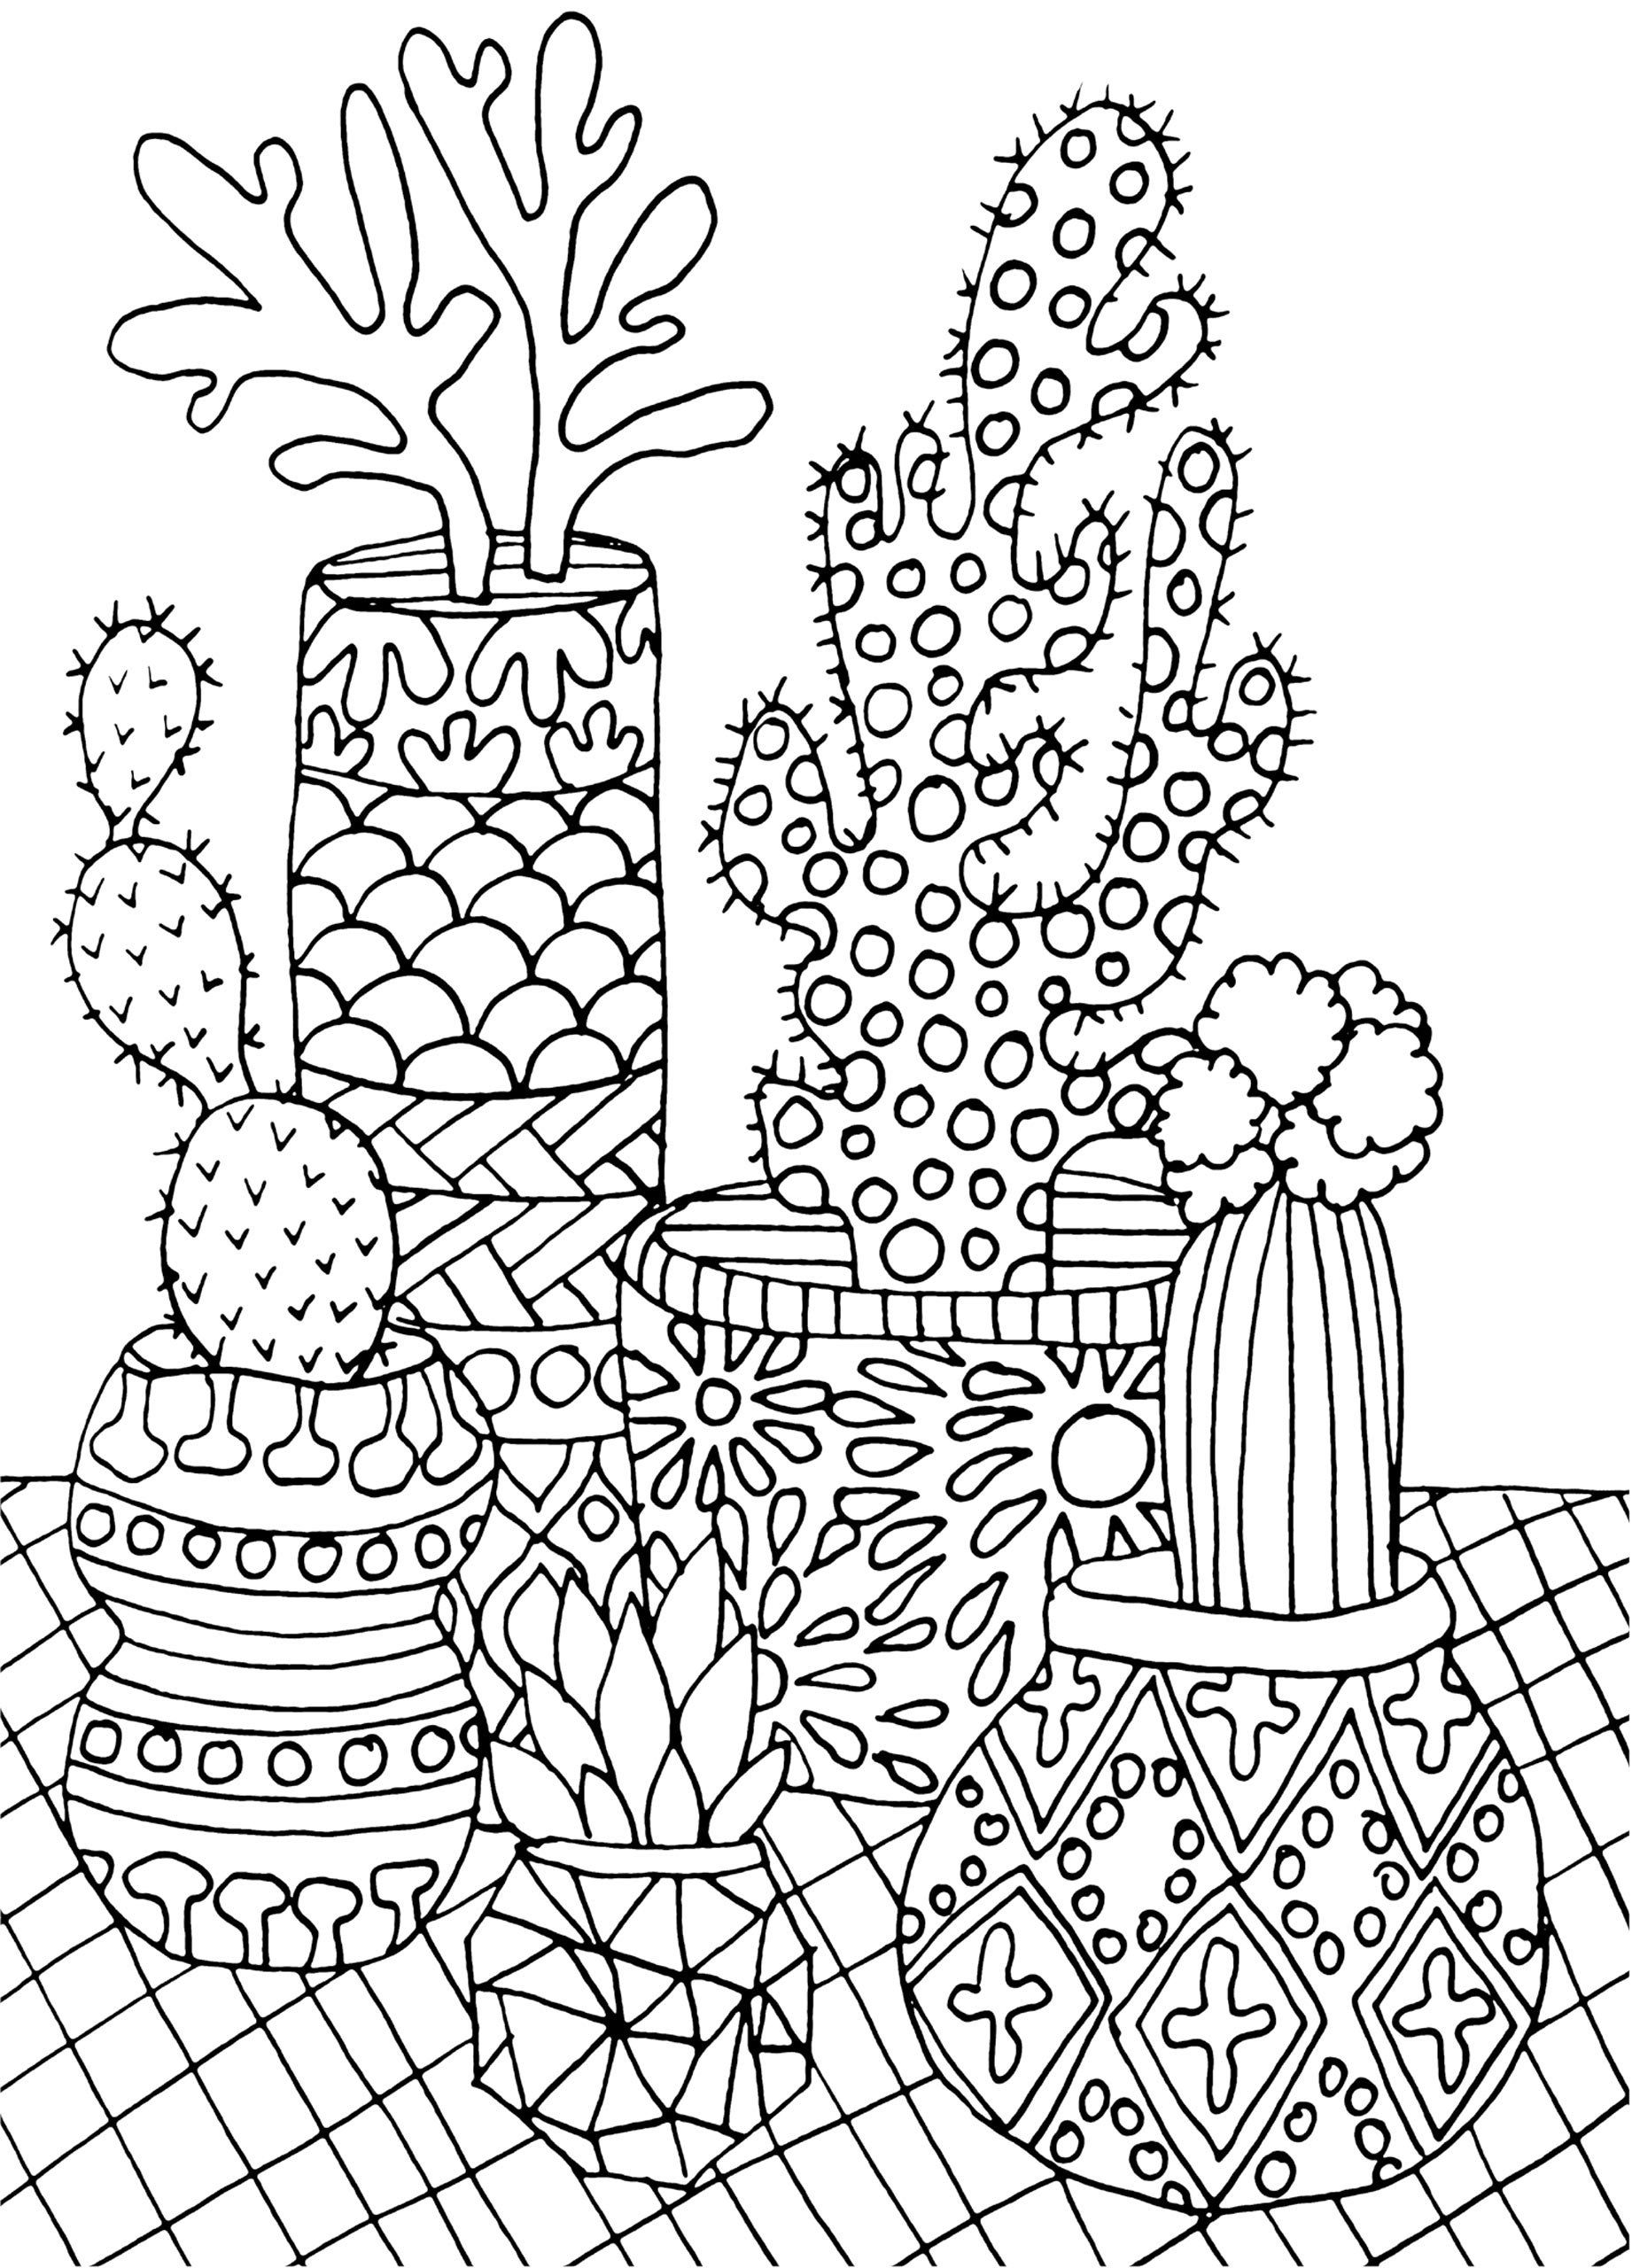 Amazon.com: Succulents Portable Adult Coloring Book (31